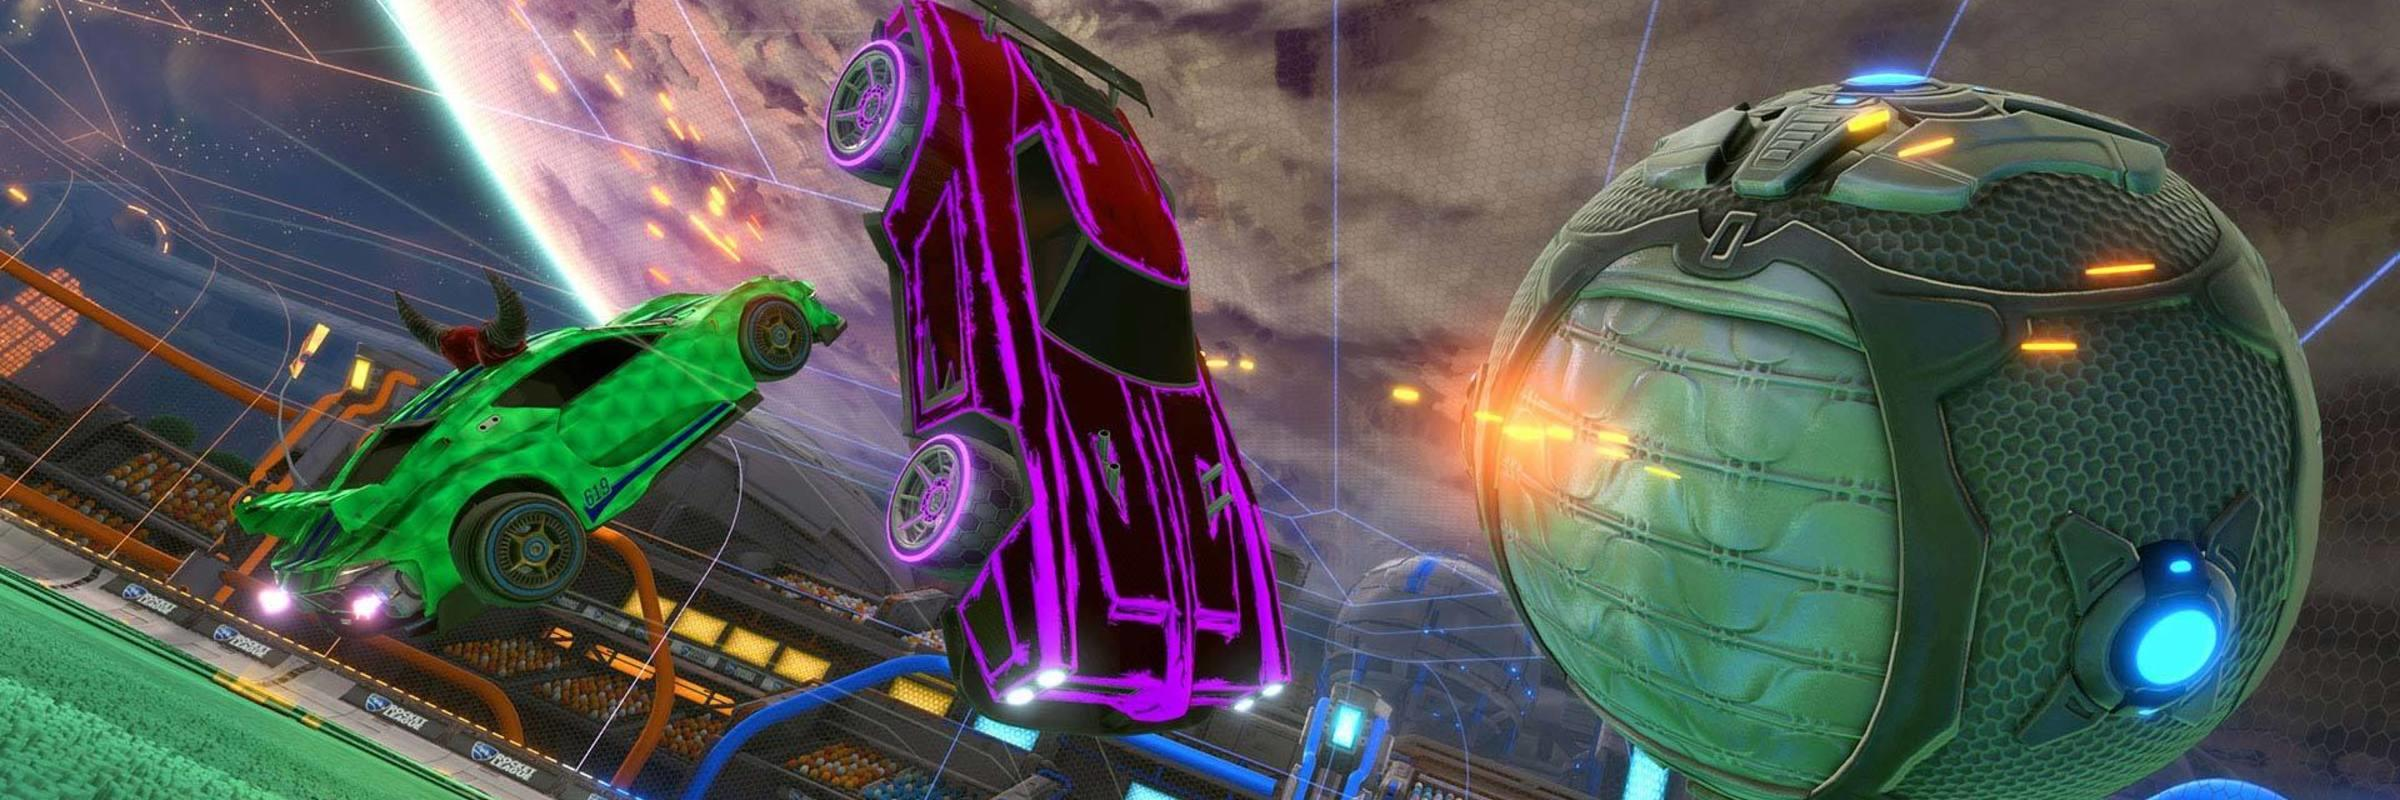 Universal Open Rocket League Returns this Summer! Image